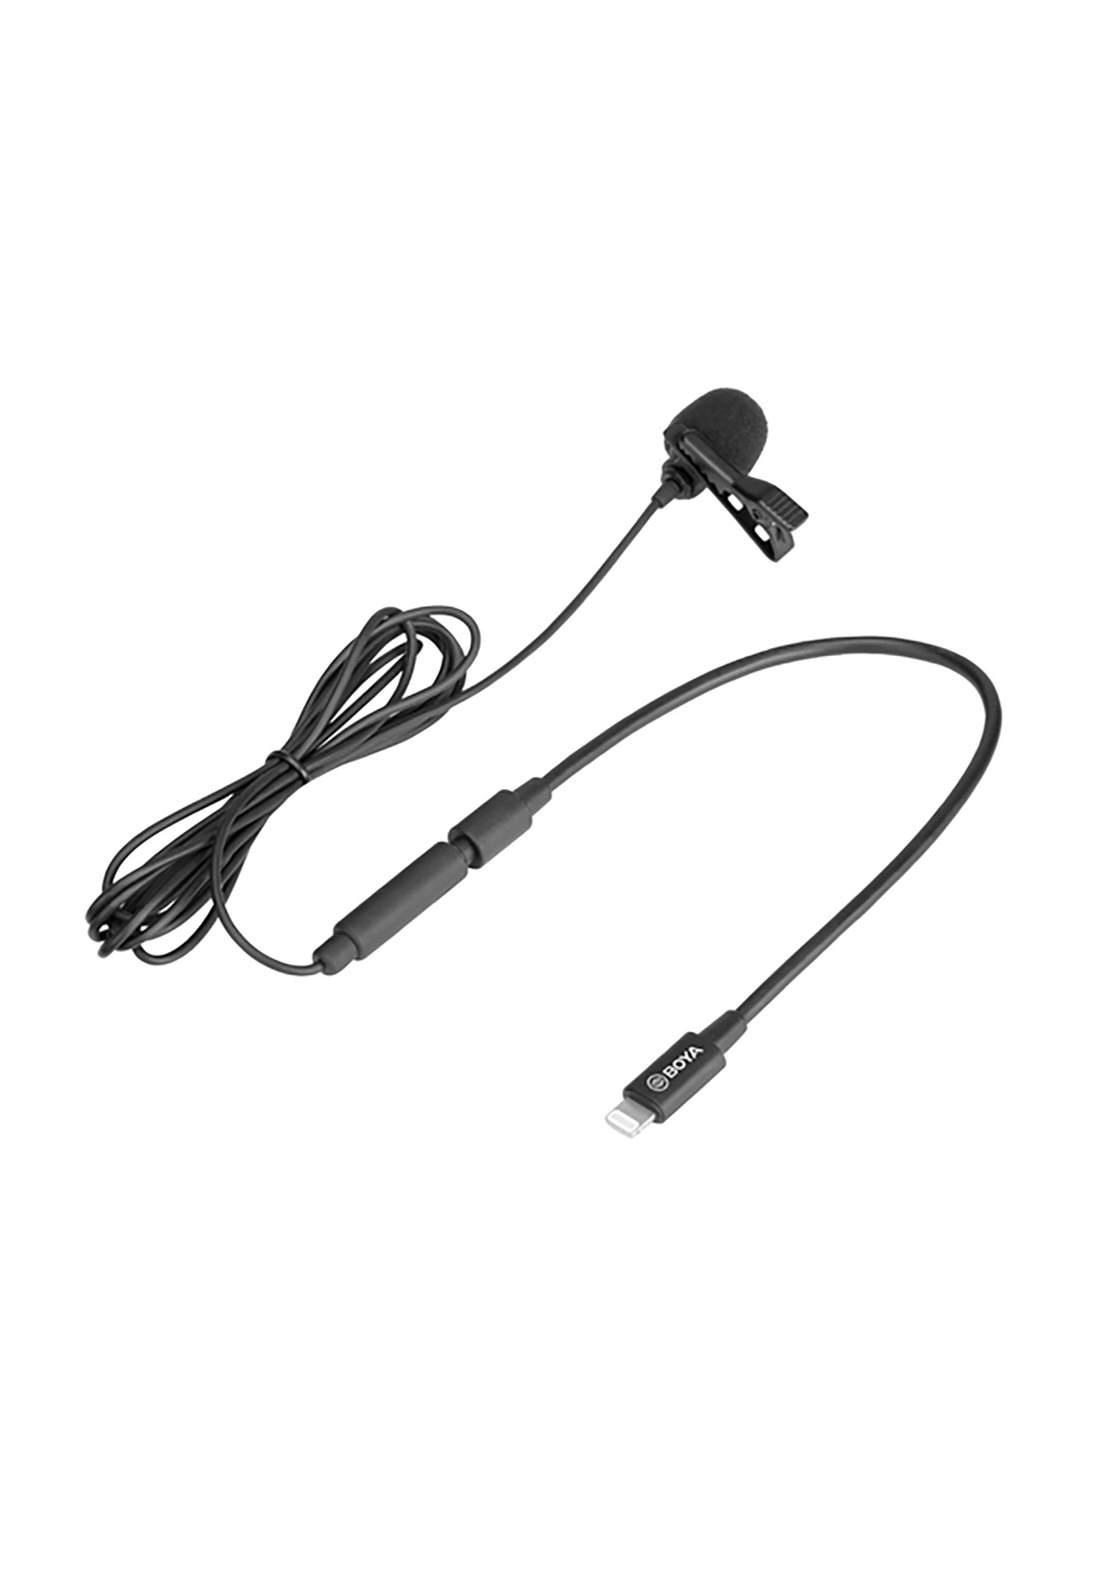 Boya BY-M2 Digital Omnidirectional Lavalier Microphone - Black مايكروفون